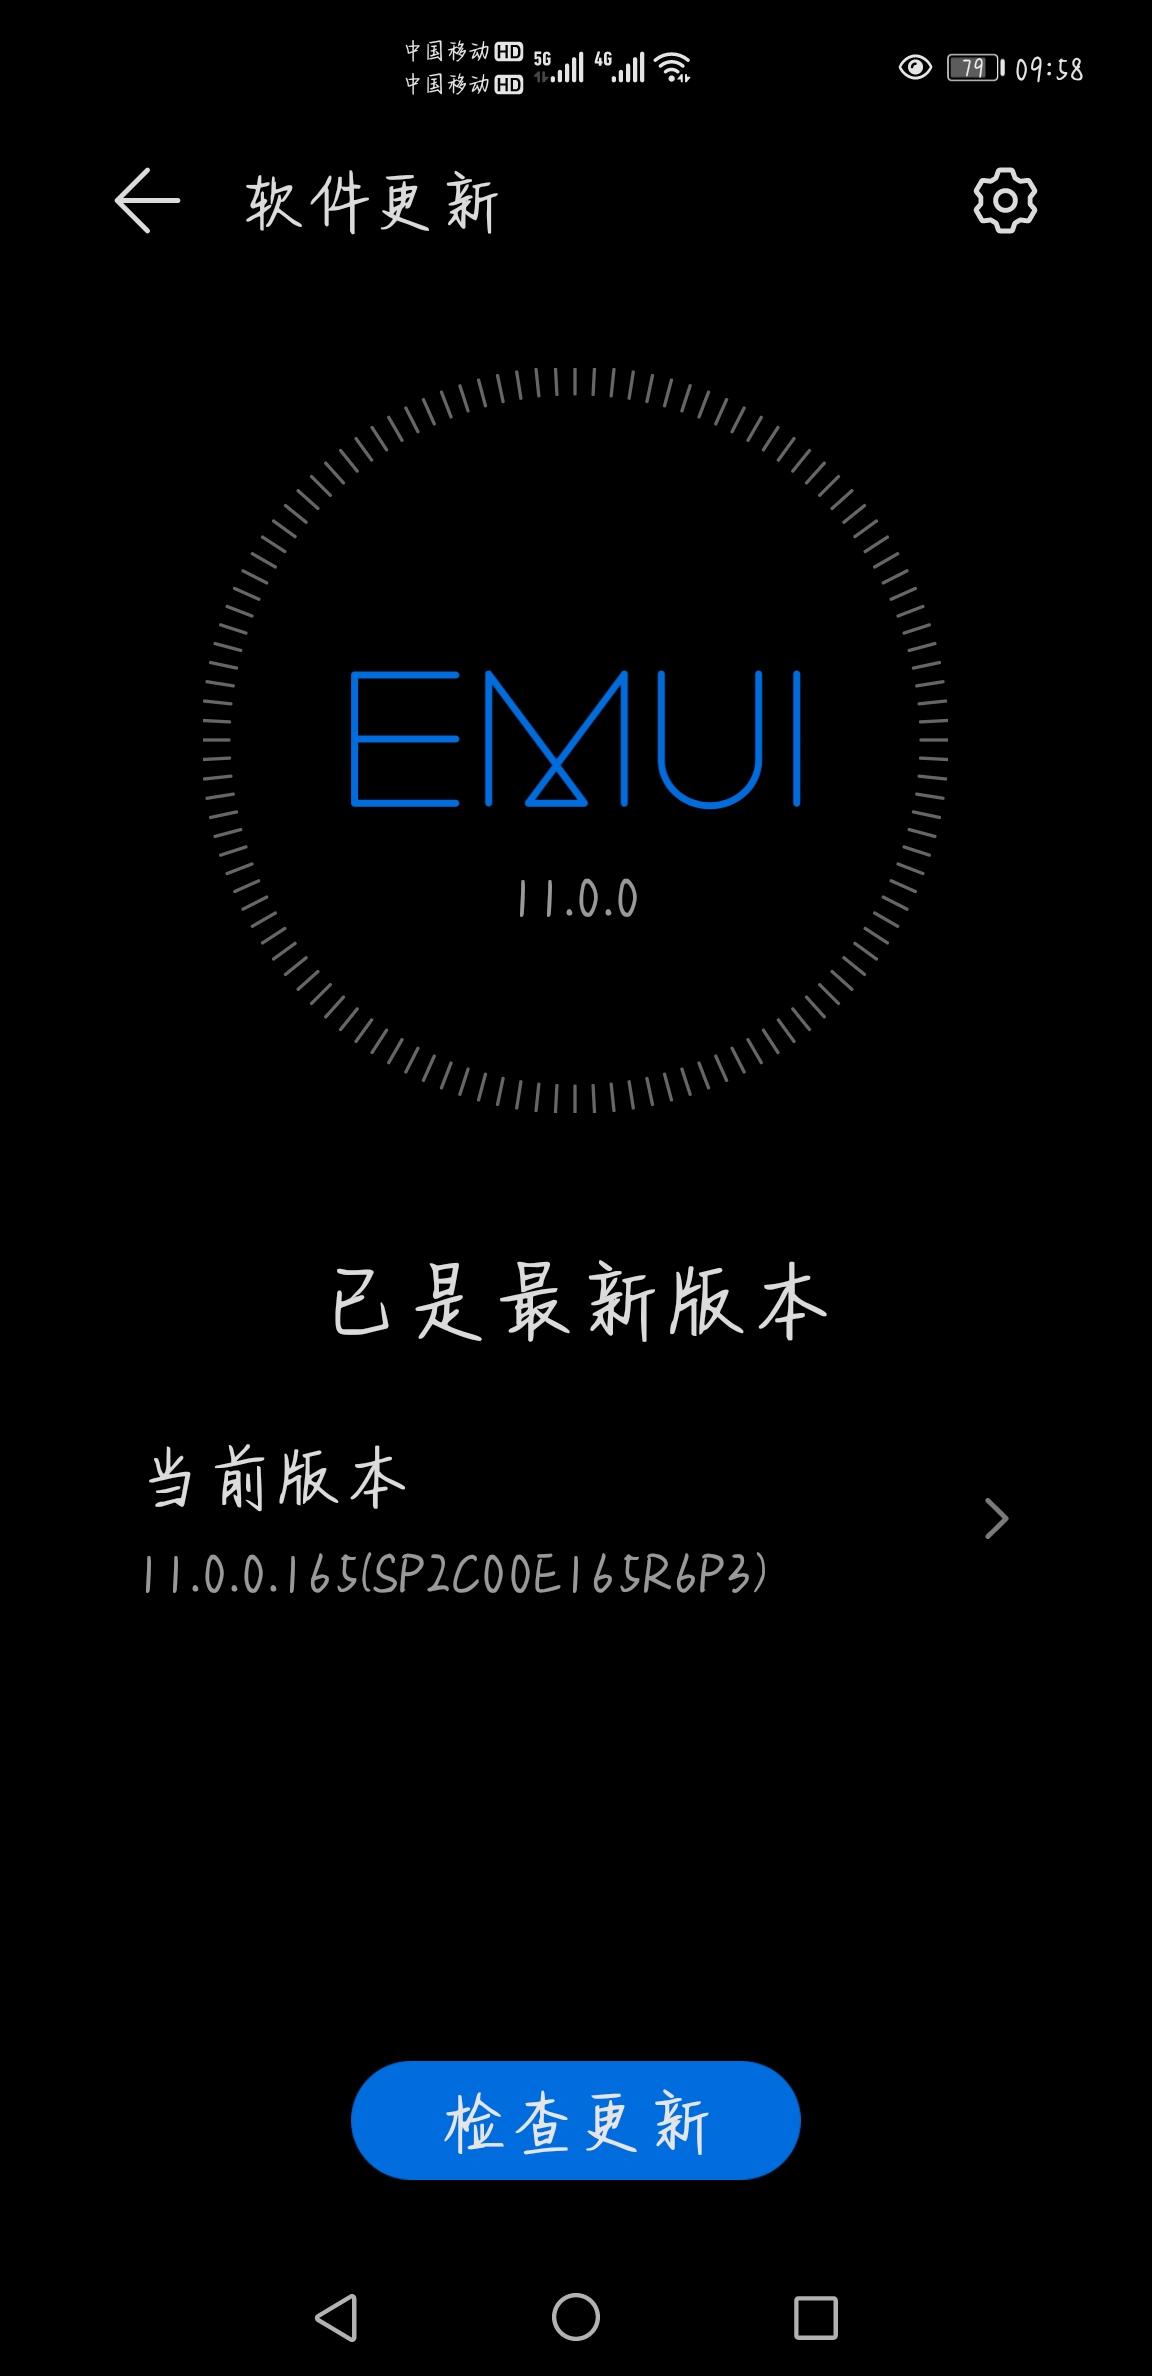 Screenshot_20210304_095829_com.huawei.android.hwouc.jpg